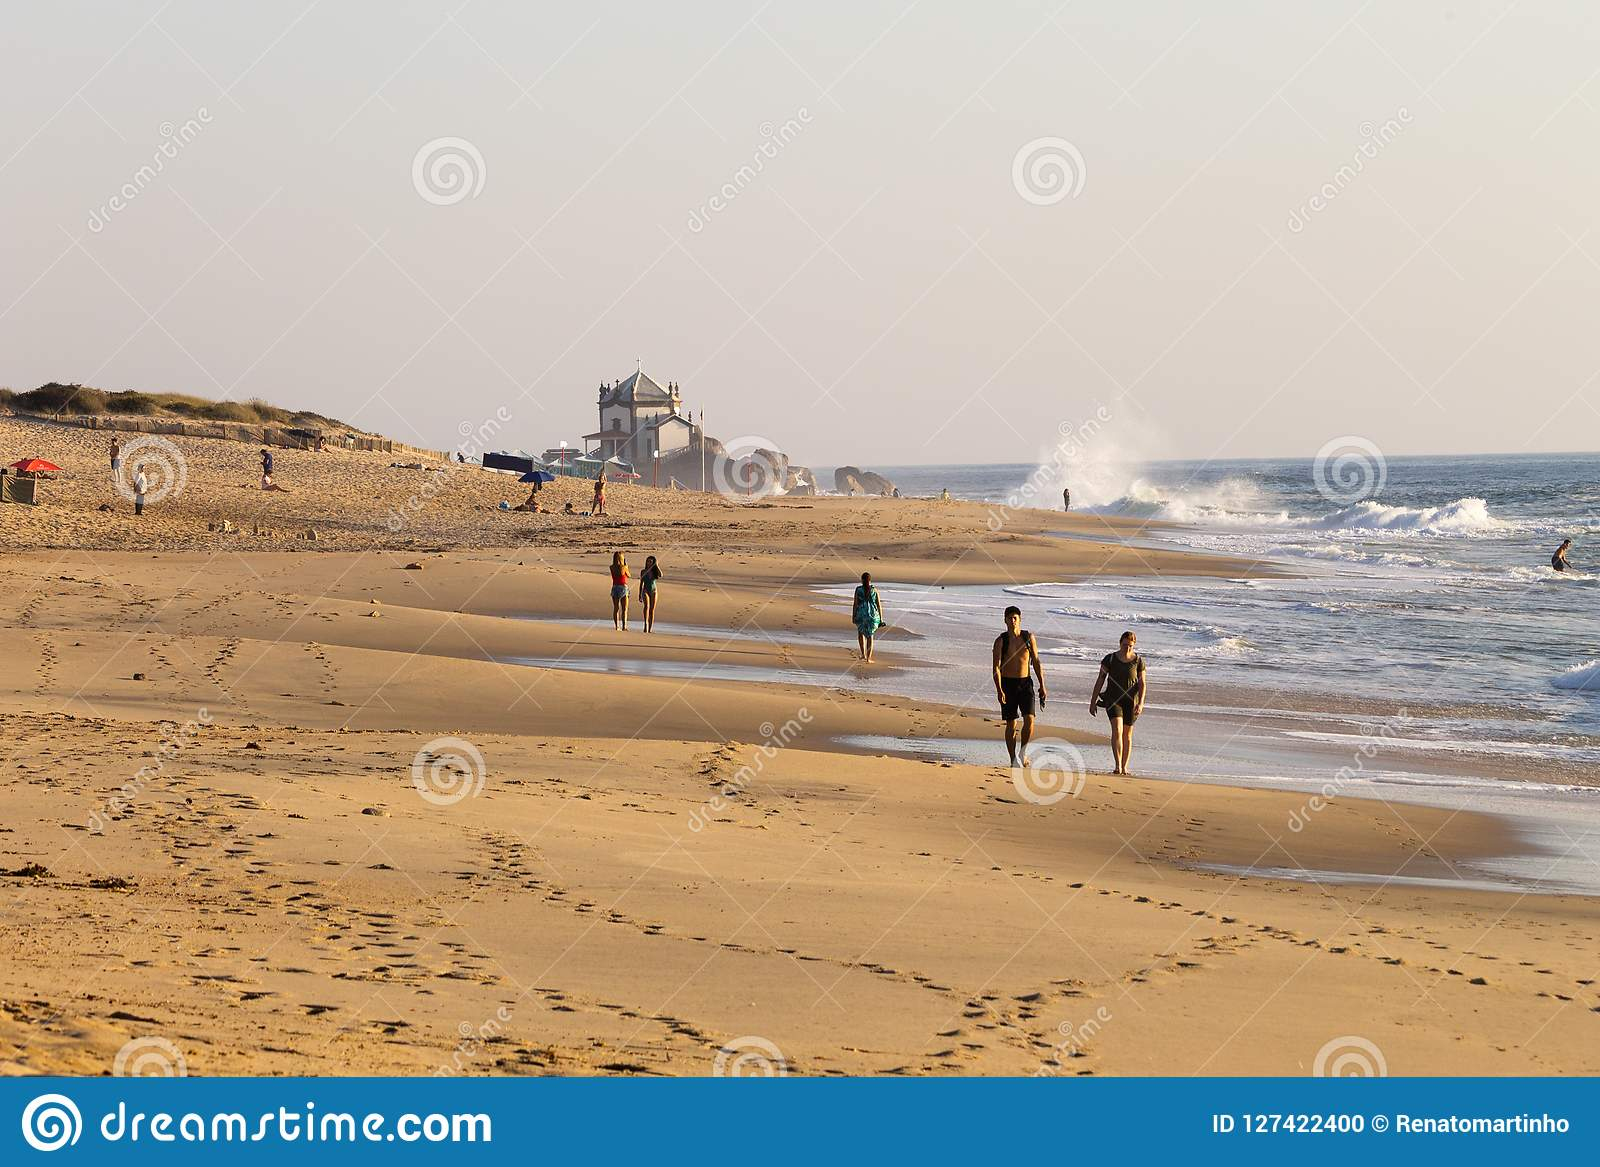 Couple Walks at the Beach